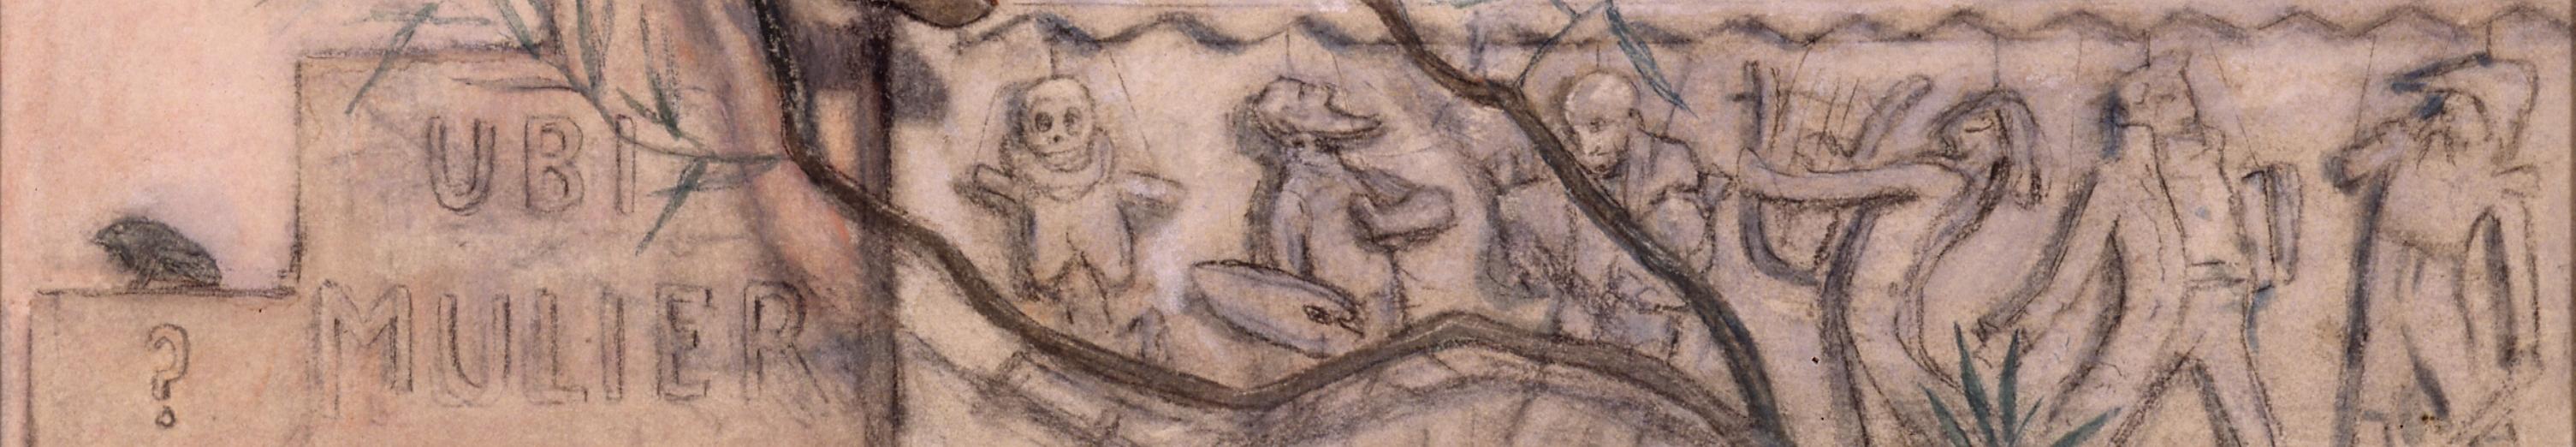 1883-85 rops Dame au Pantin  detail frise